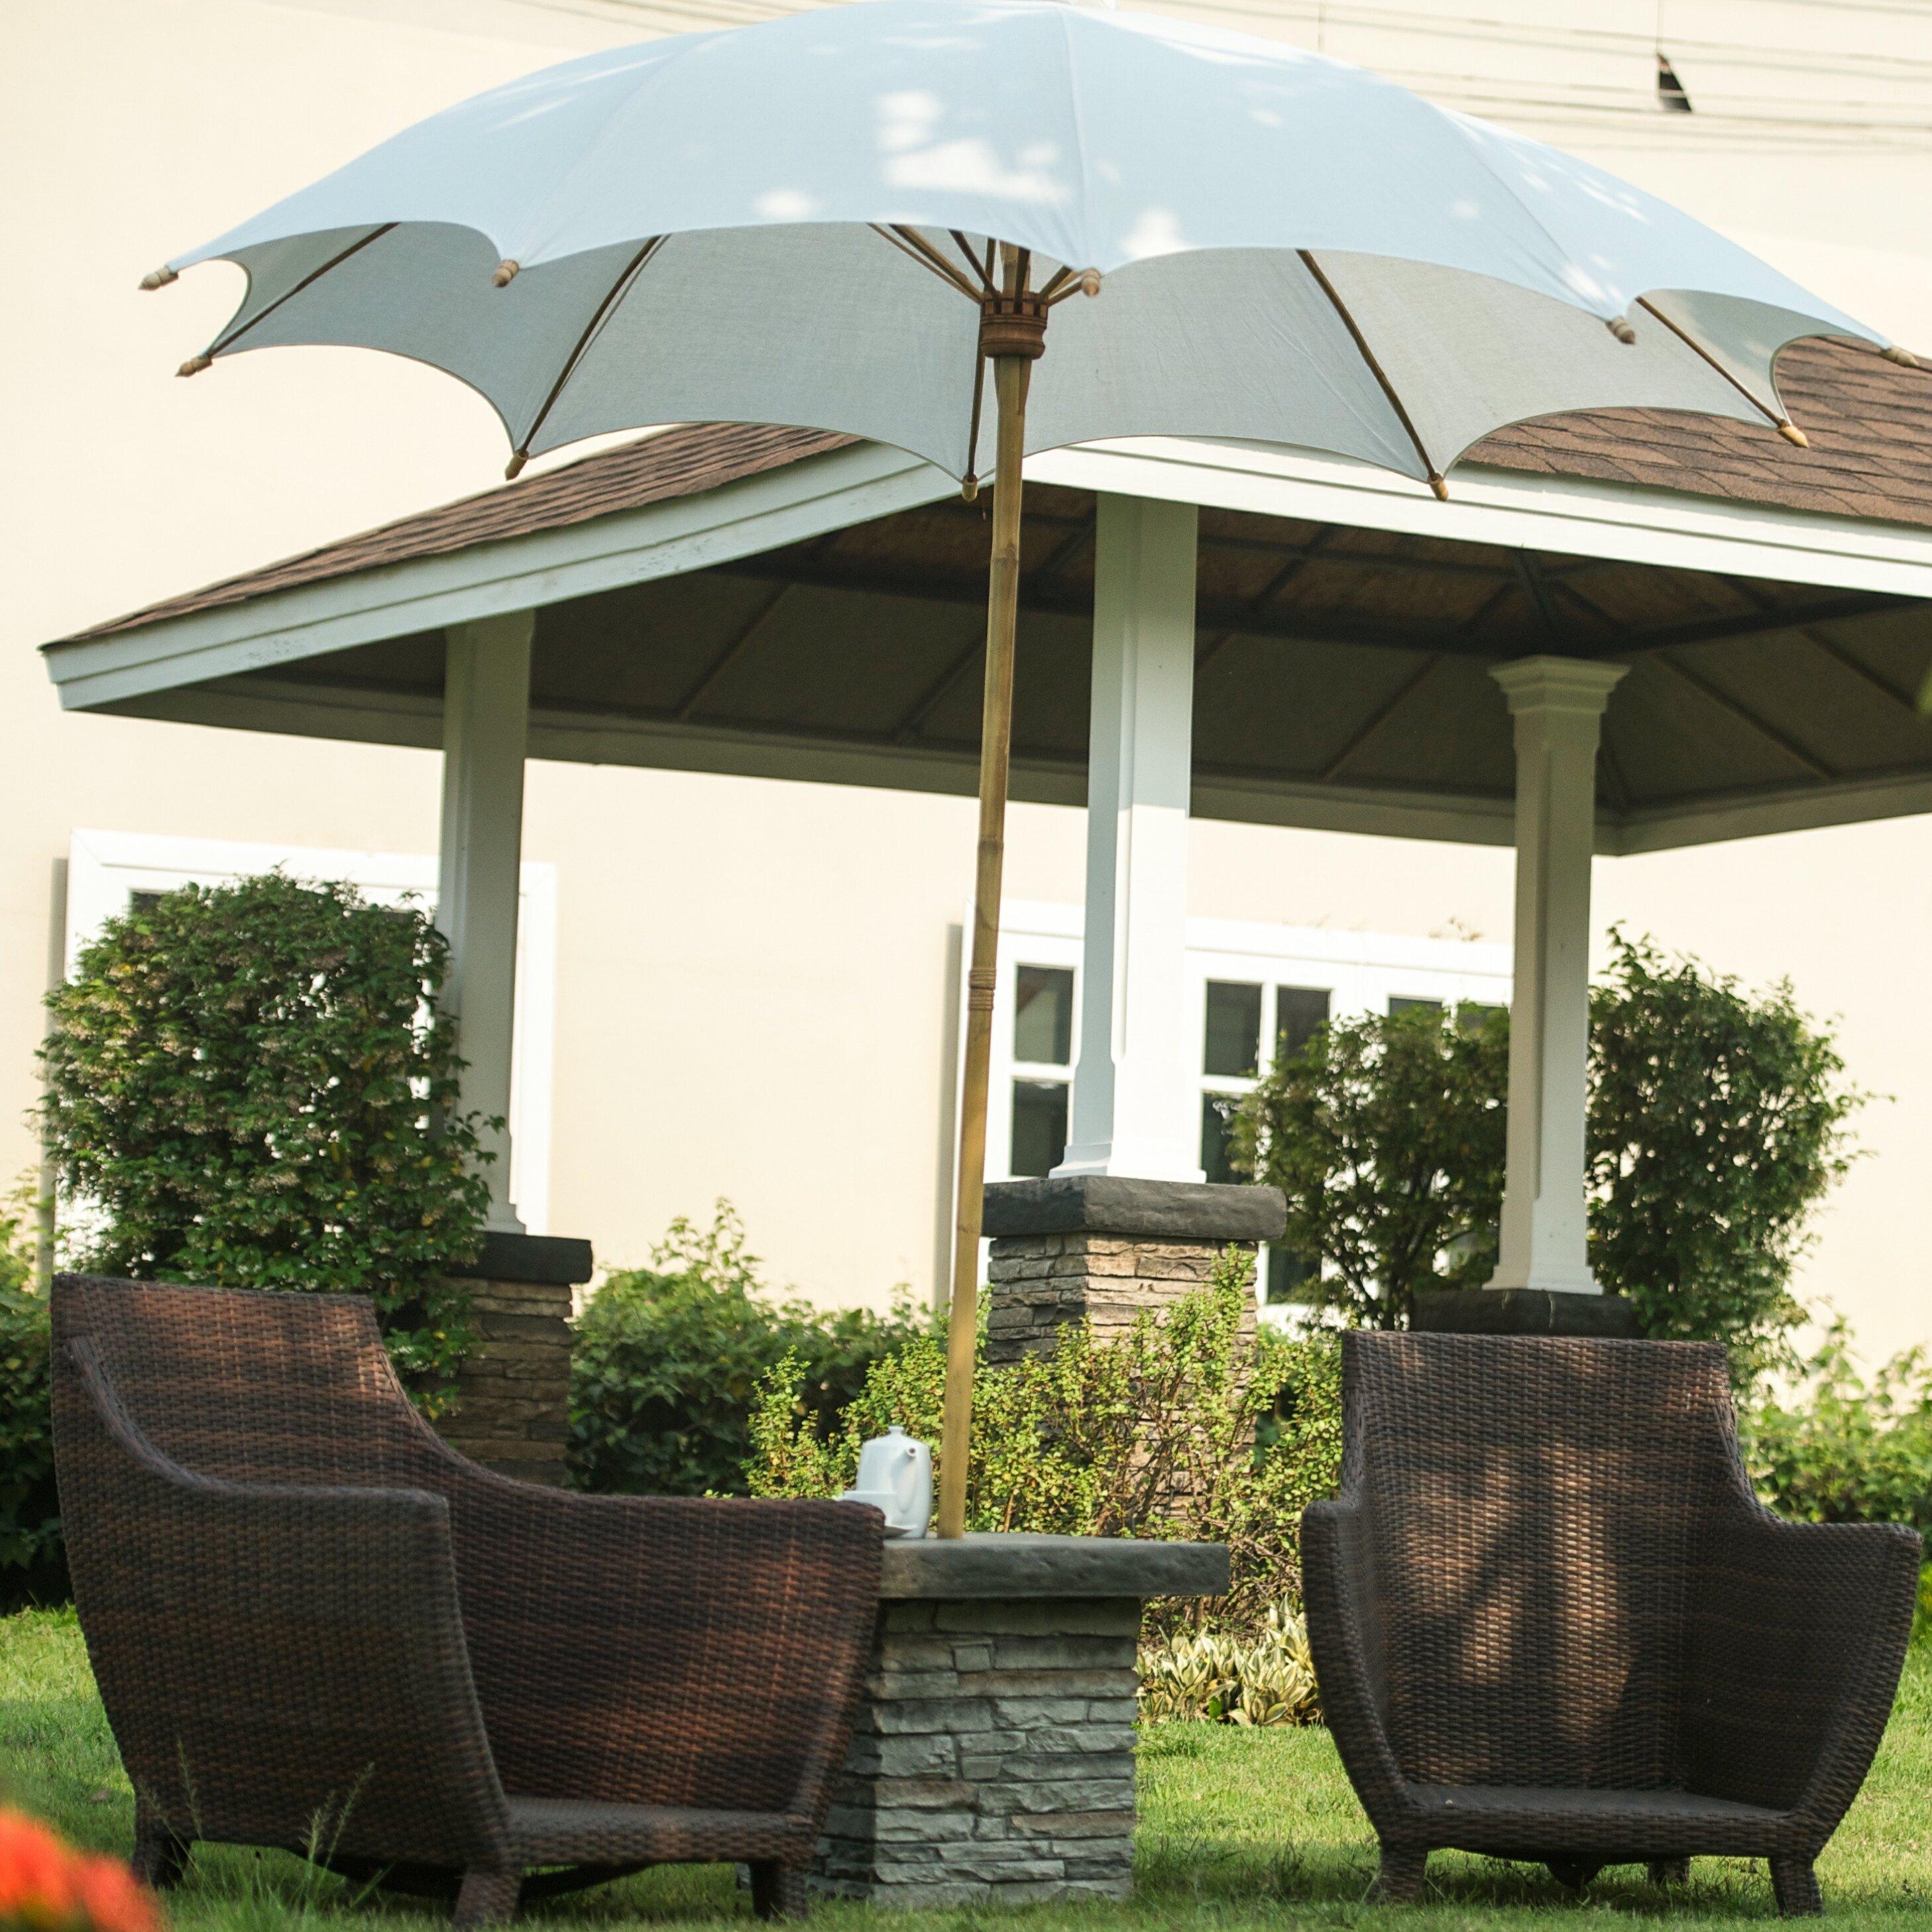 Patio Umbrella Table: EyeLevel Table Patio Umbrella Stand & Reviews